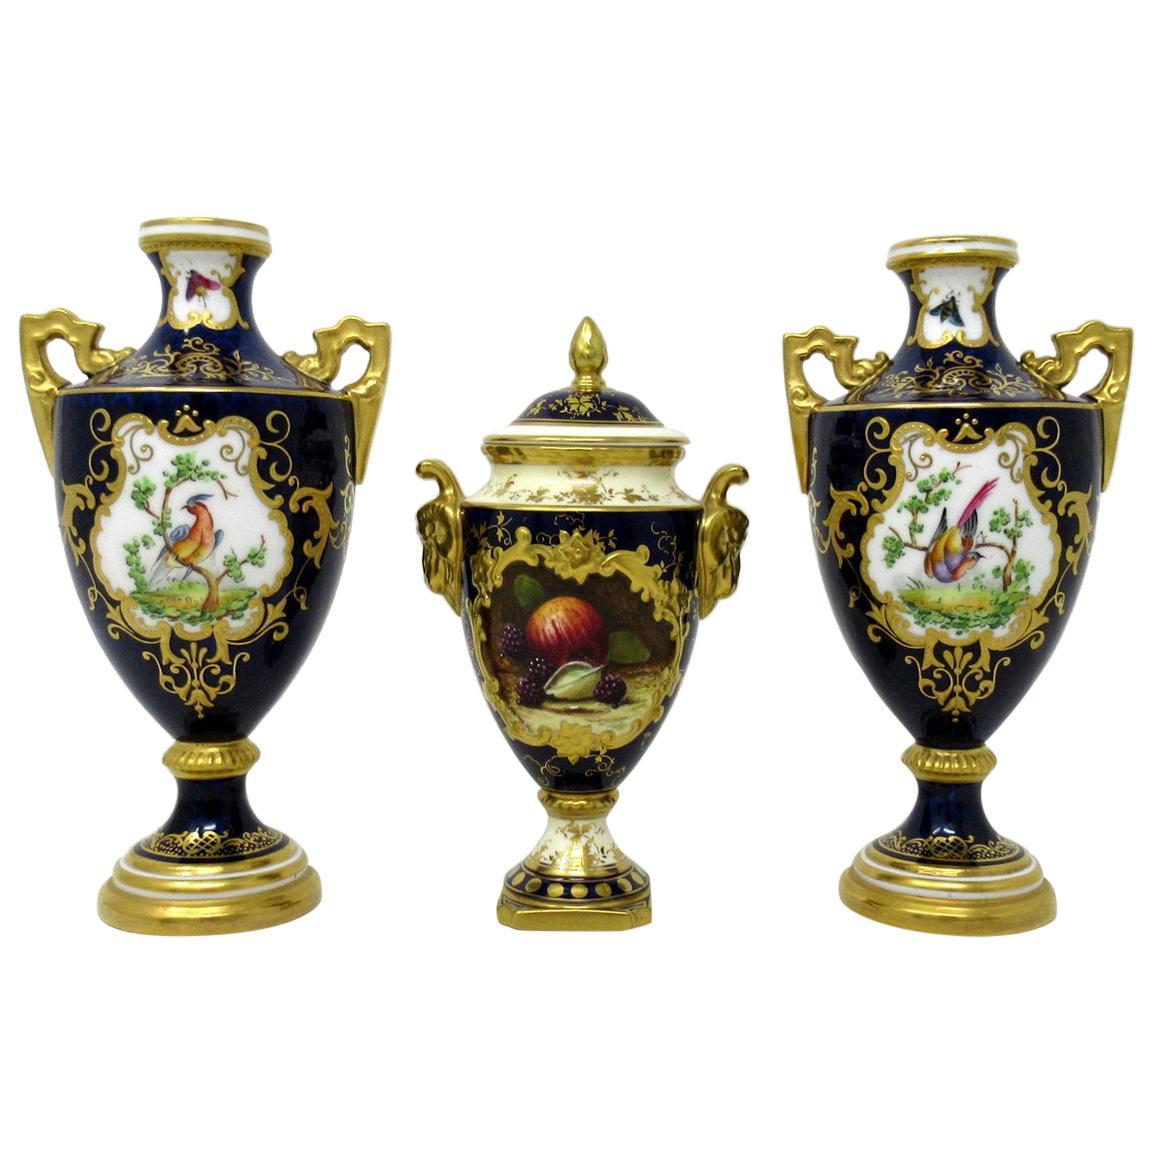 Garniture Coalport Porcelain Vases Urns Hand Painted Still Life Flowers Birds